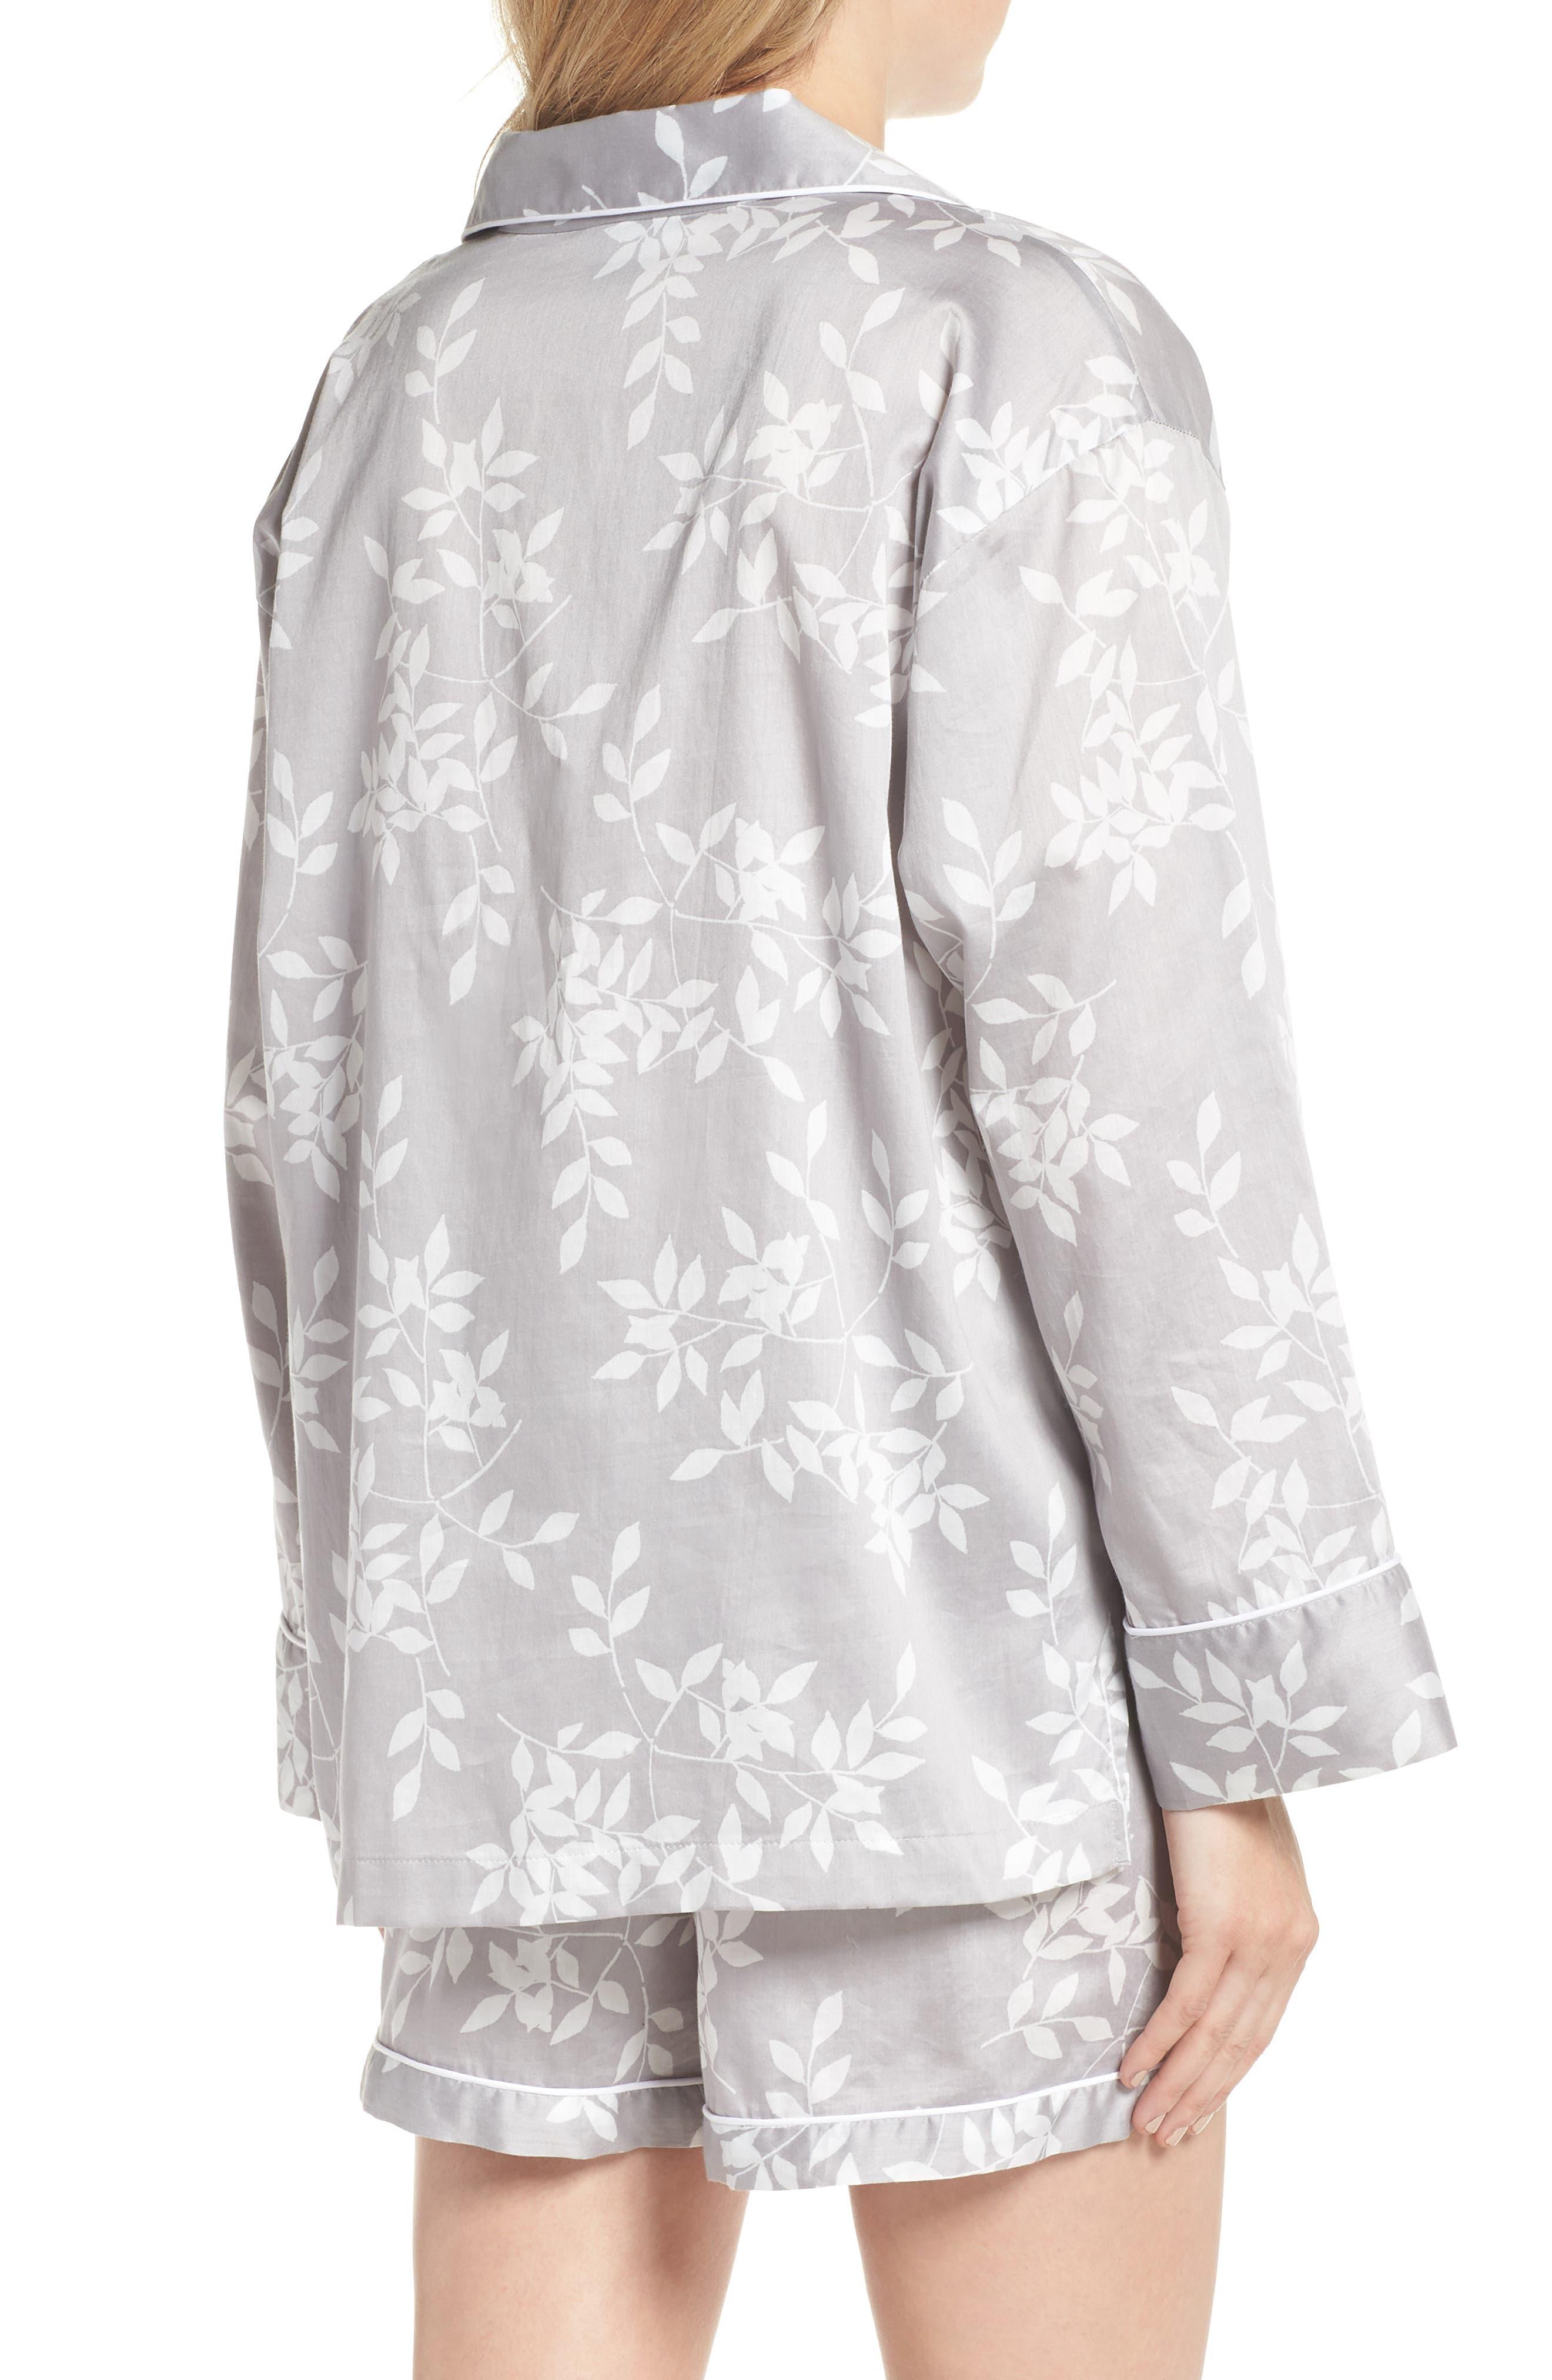 Branch Print Cotton Sateen Short Pajamas,                             Alternate thumbnail 2, color,                             021